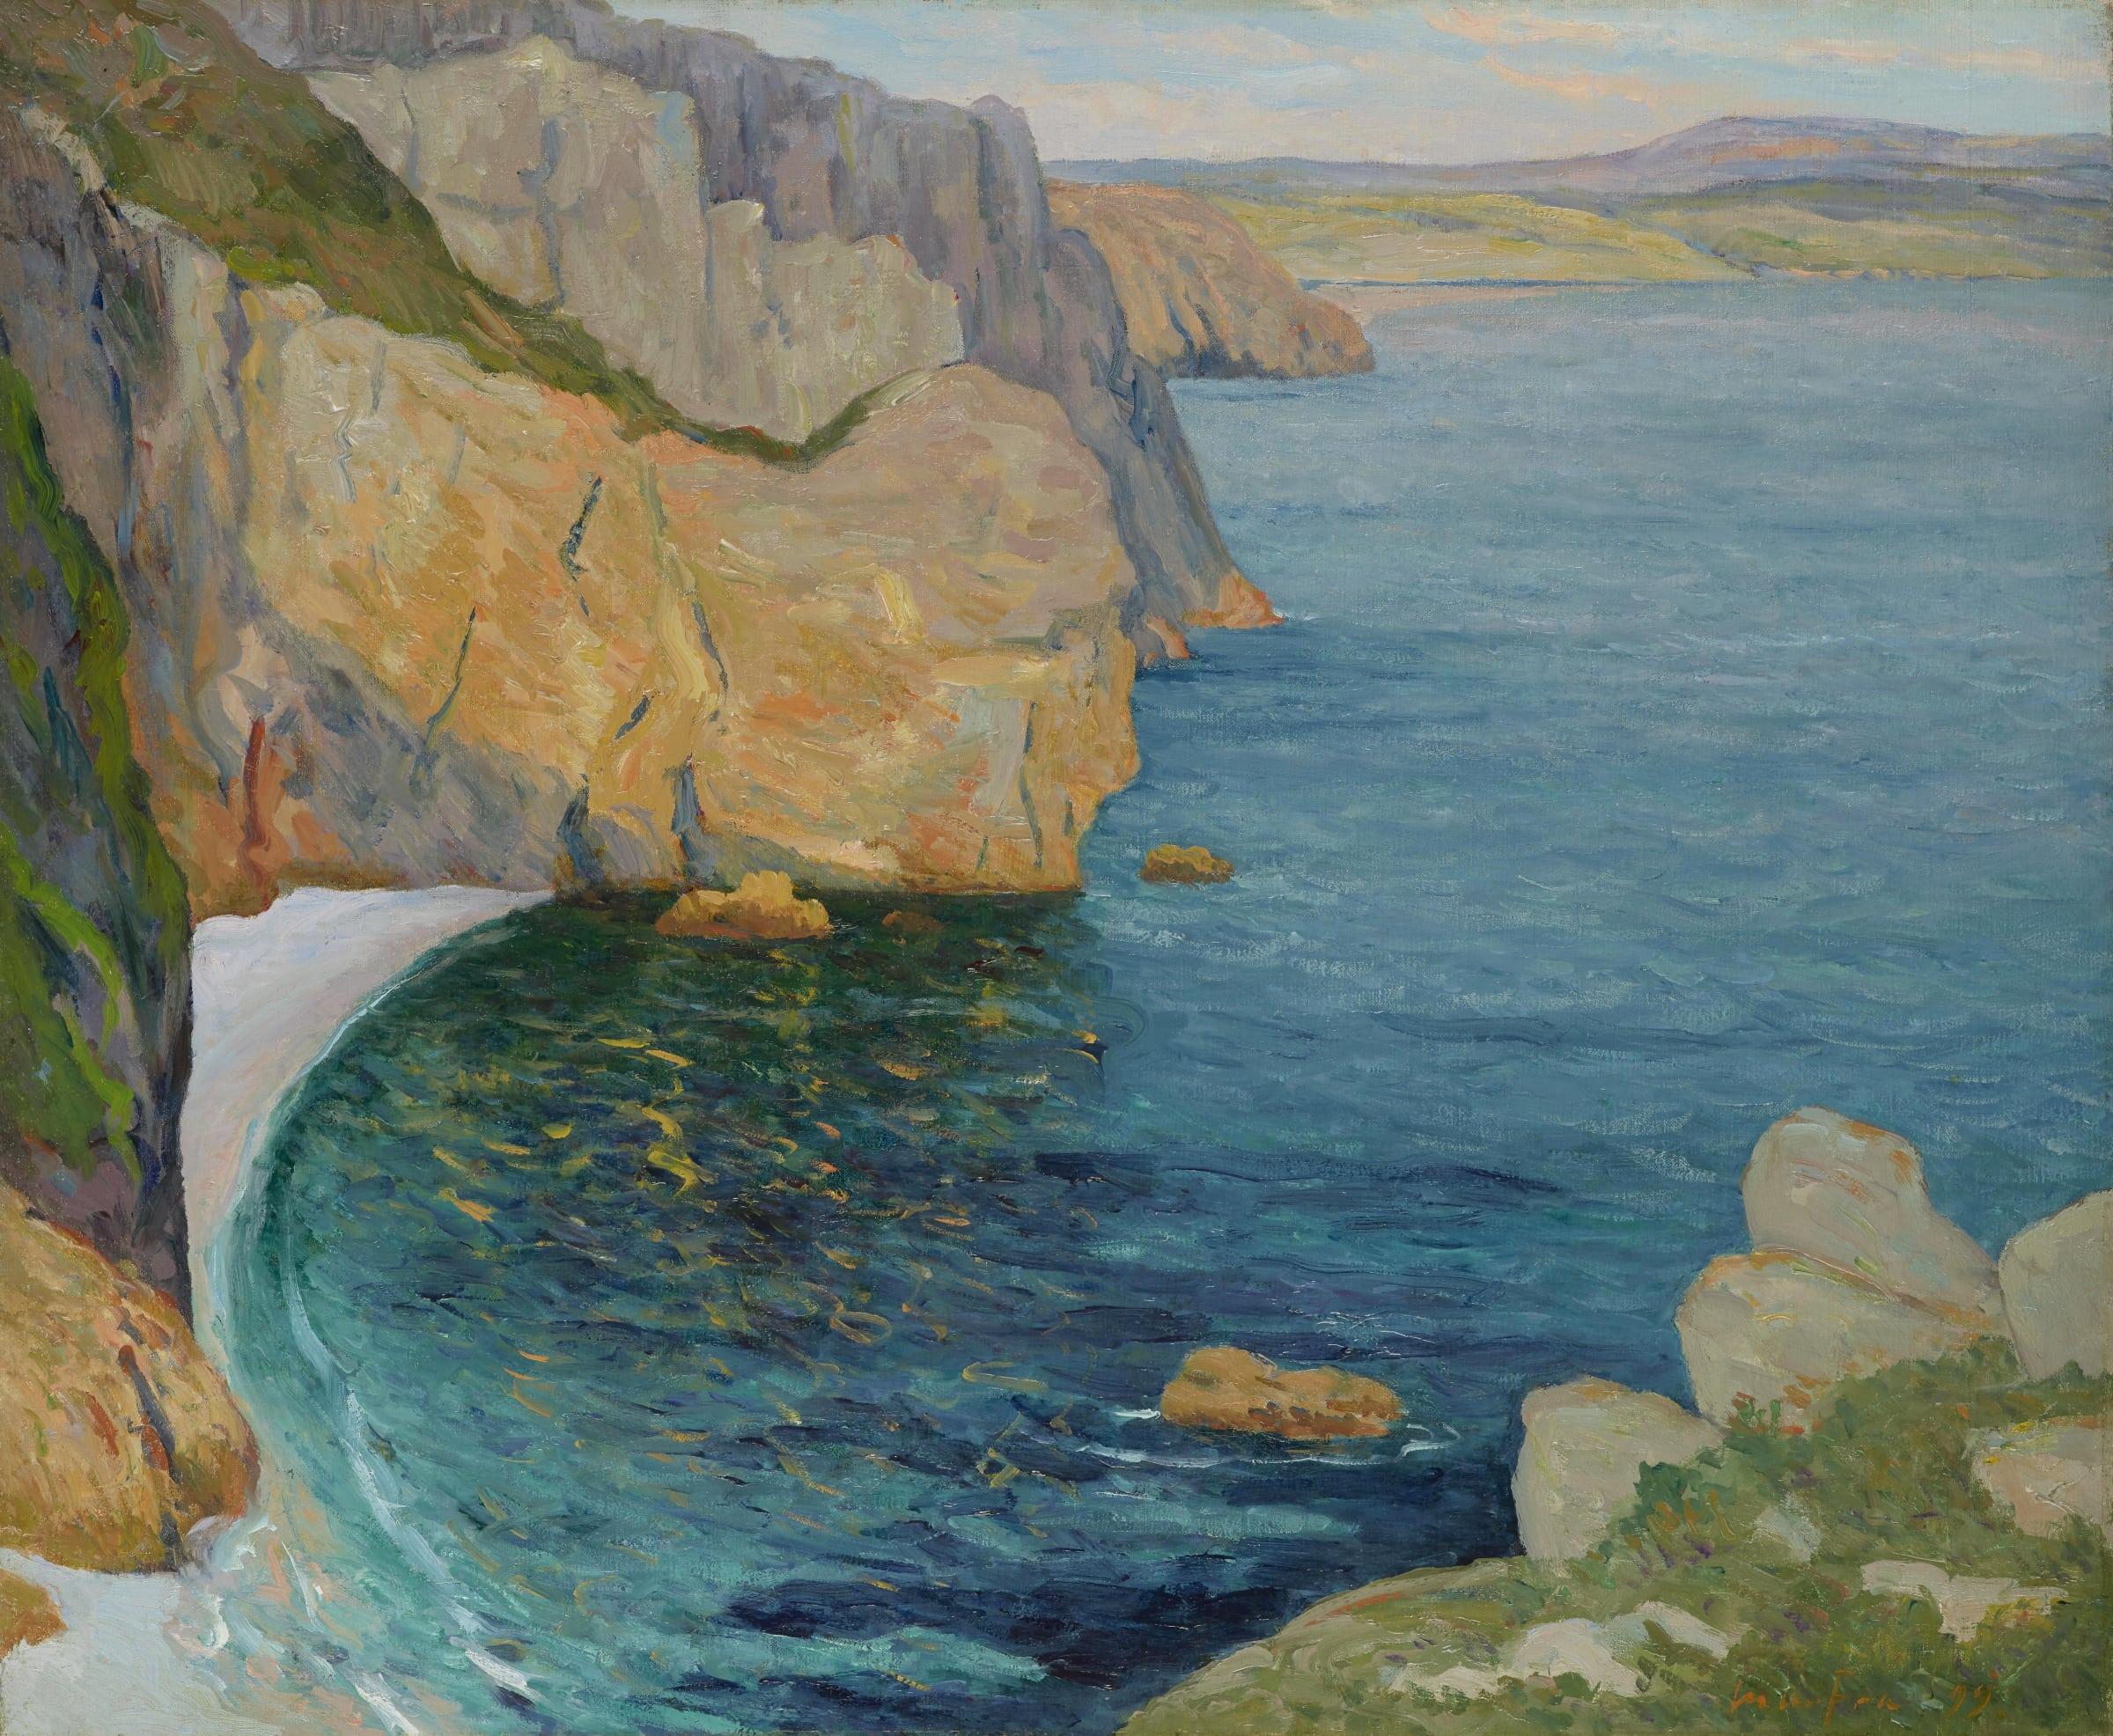 <span class=&#34;link fancybox-details-link&#34;><a href=&#34;/artists/64-maxime-maufra/works/9407-maxime-maufra-calme-d-t-baie-de-douarnenez-1899/&#34;>View Detail Page</a></span><div class=&#34;artist&#34;><span class=&#34;artist&#34;><strong>Maxime Maufra</strong></span></div><div class=&#34;title&#34;><em>Calme d'été, baie de Douarnenez</em>, 1899</div><div class=&#34;signed_and_dated&#34;>Signed and dated lower right</div><div class=&#34;medium&#34;>Oil on canvas</div><div class=&#34;dimensions&#34;>60.3 x 81 cm<br /> 23 3/4 x 31 ½ inches</div>